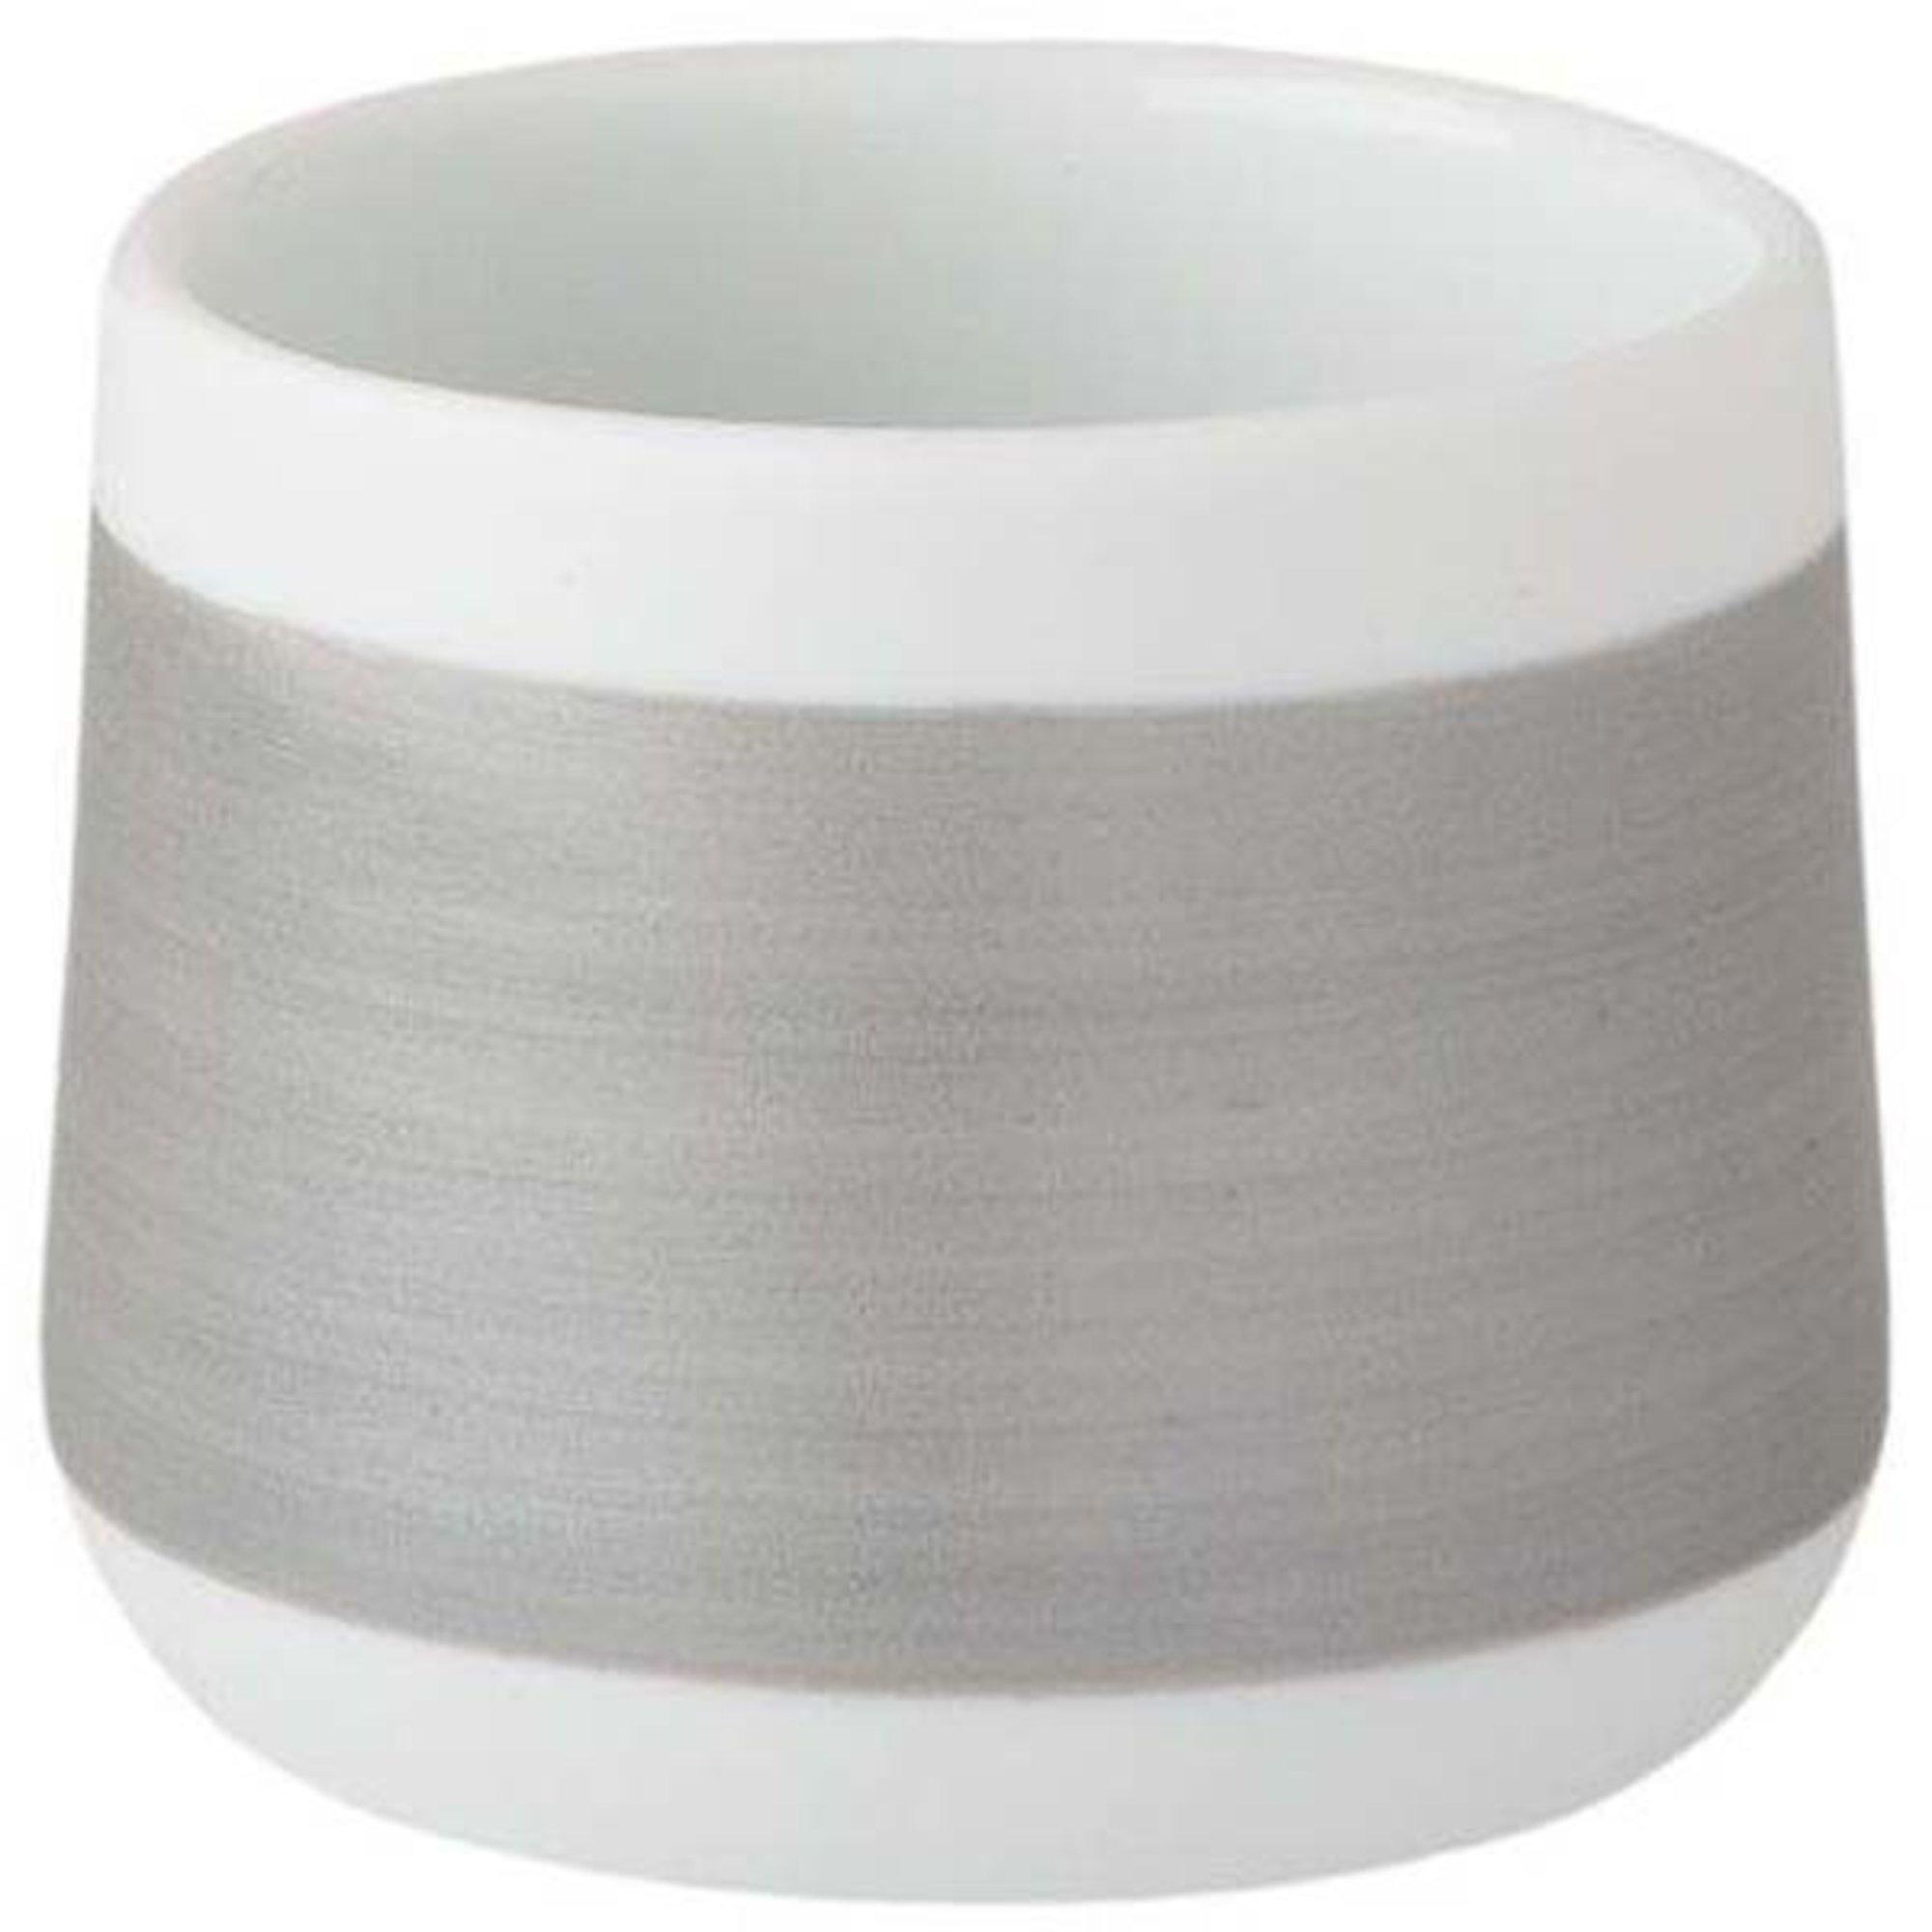 Wik & Walsøe Håndmalt Ljuslykta 5,5 cm Silver